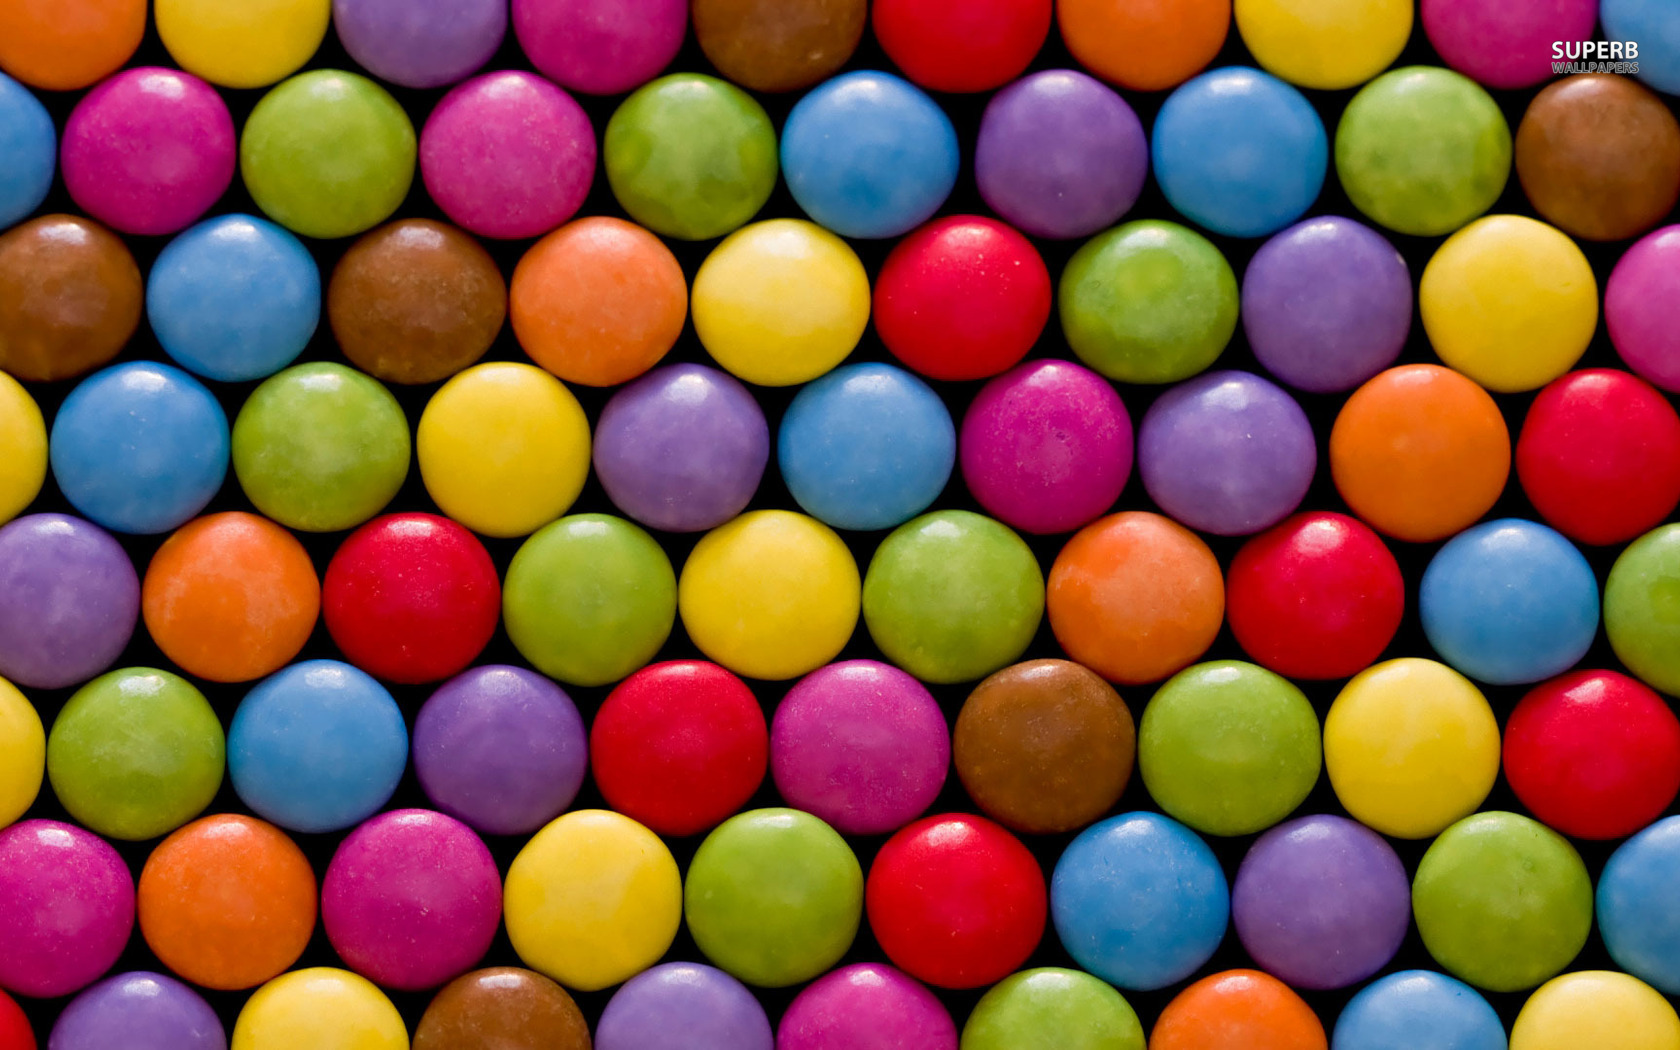 wall candy wallpaper rolls - photo #17